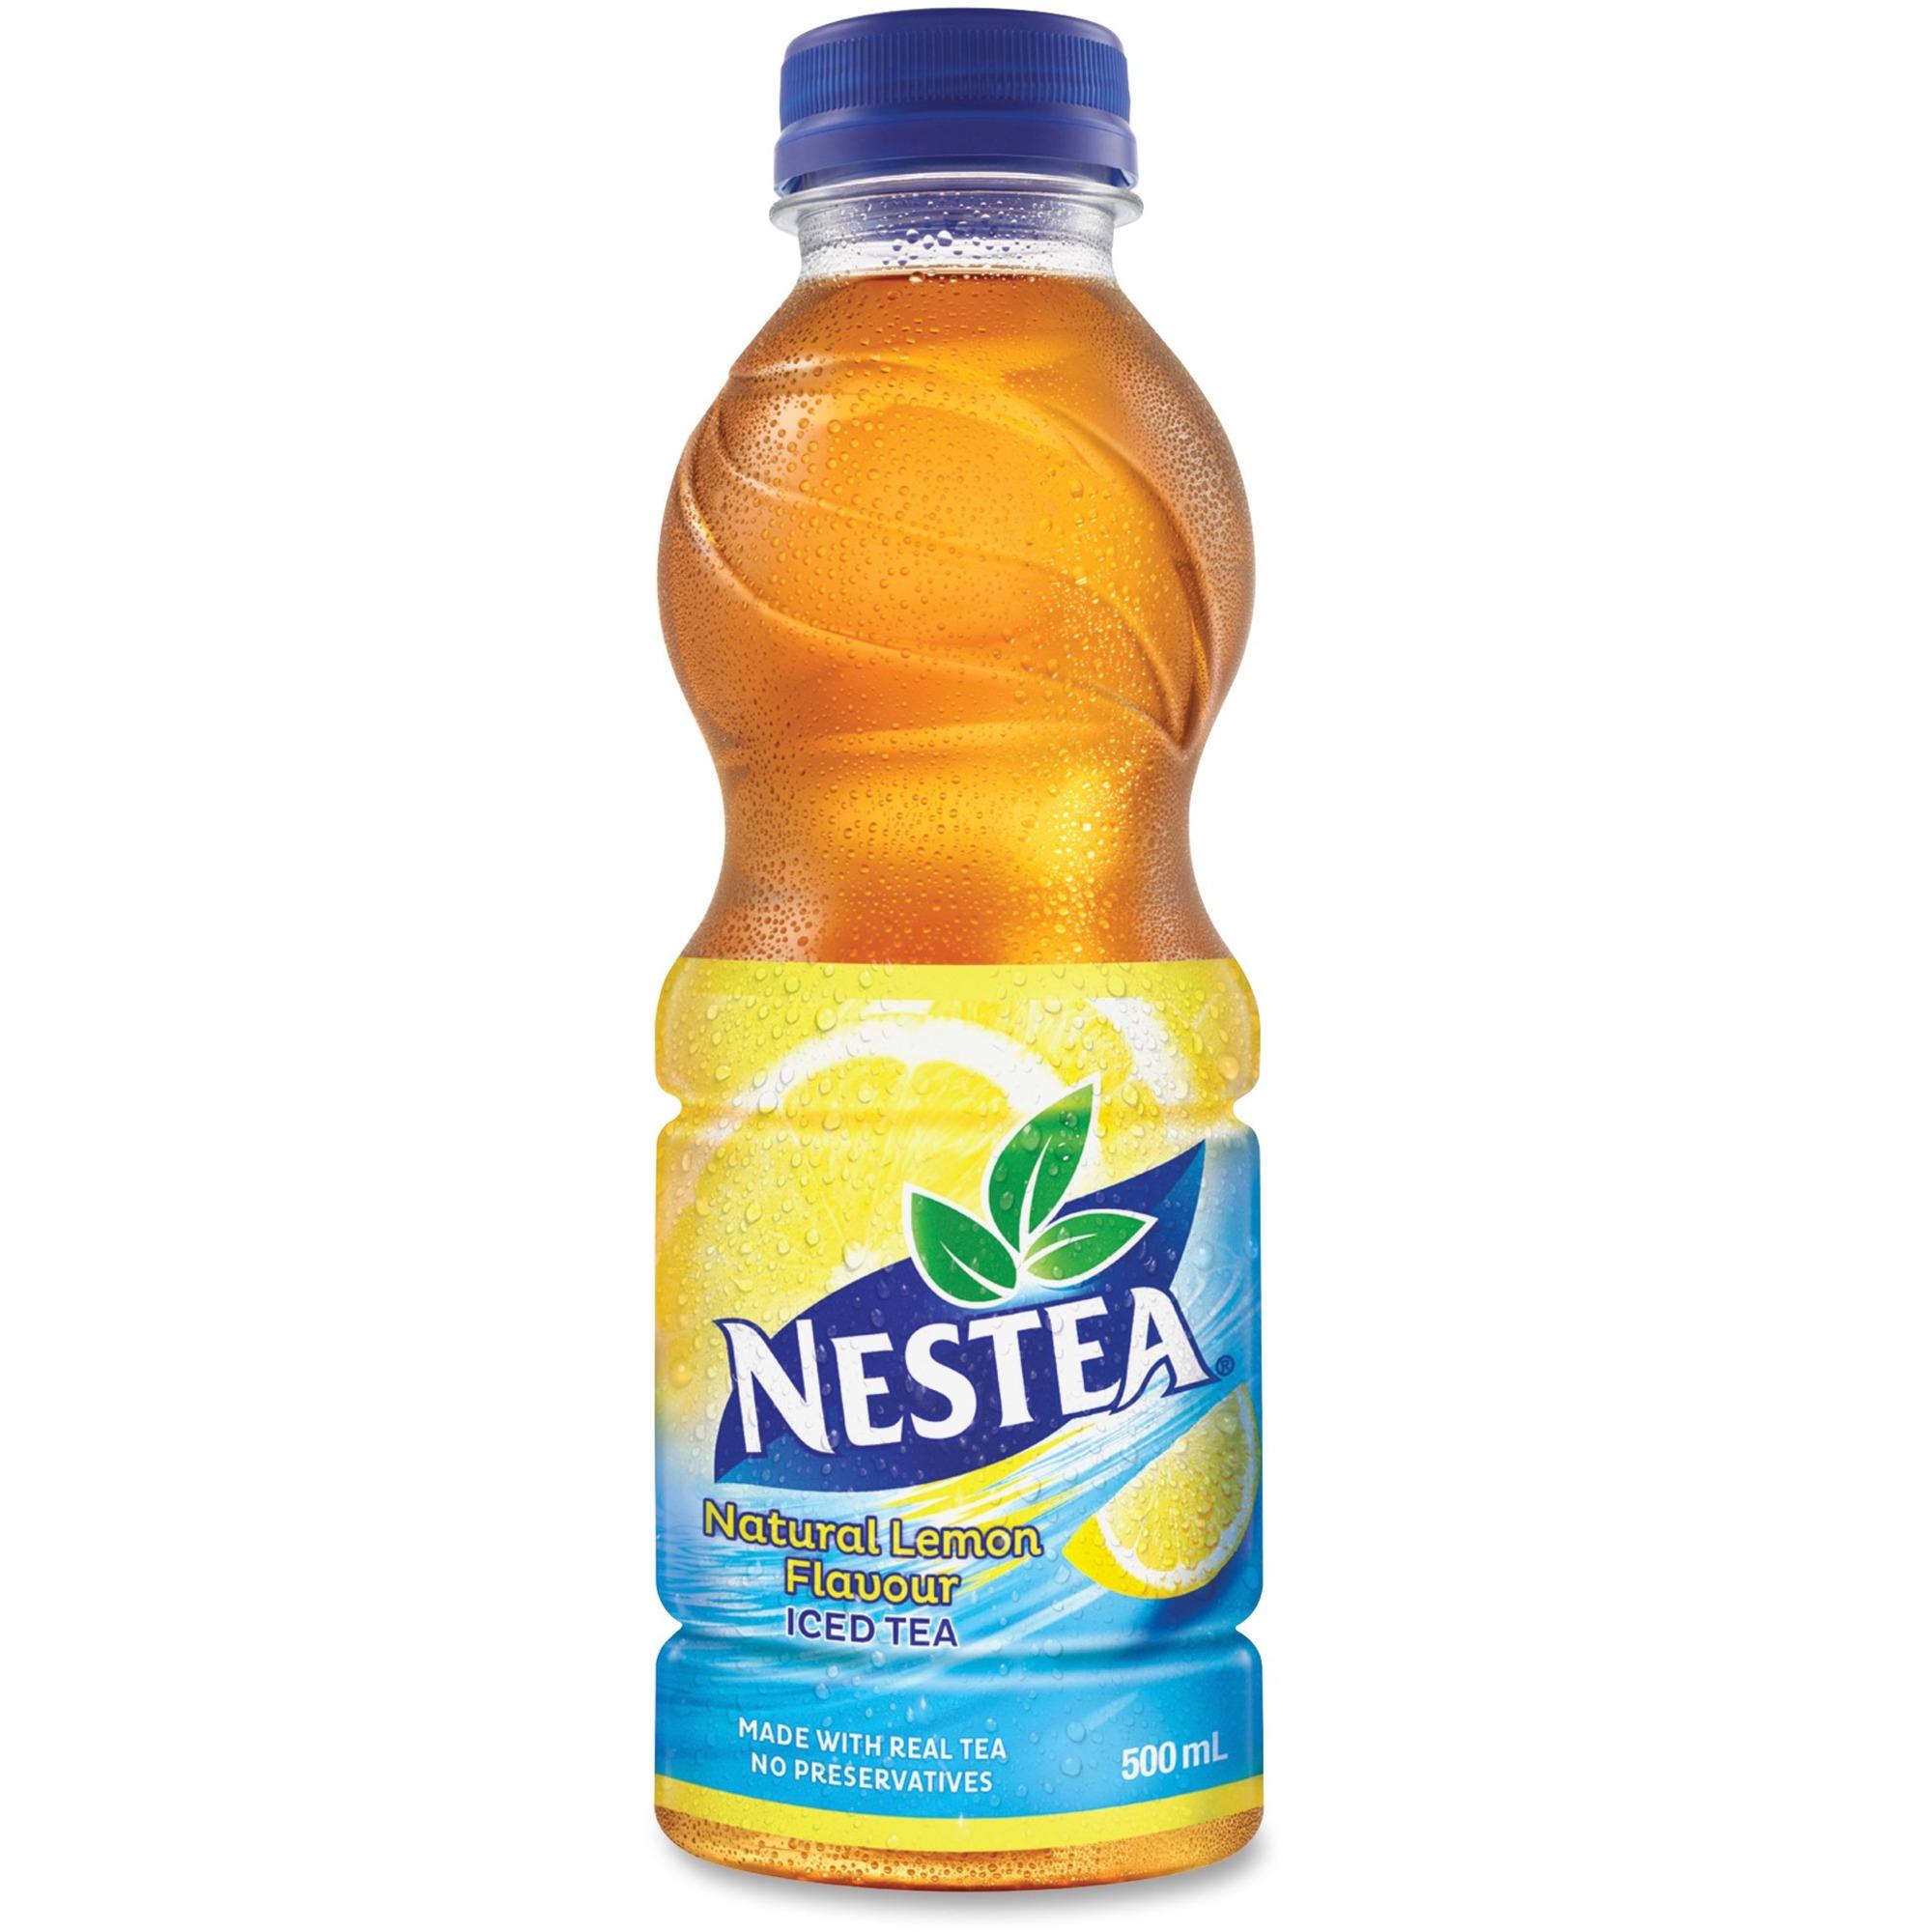 Nestea natural lemon iced tea drink ready to drink for Drinks with iced tea